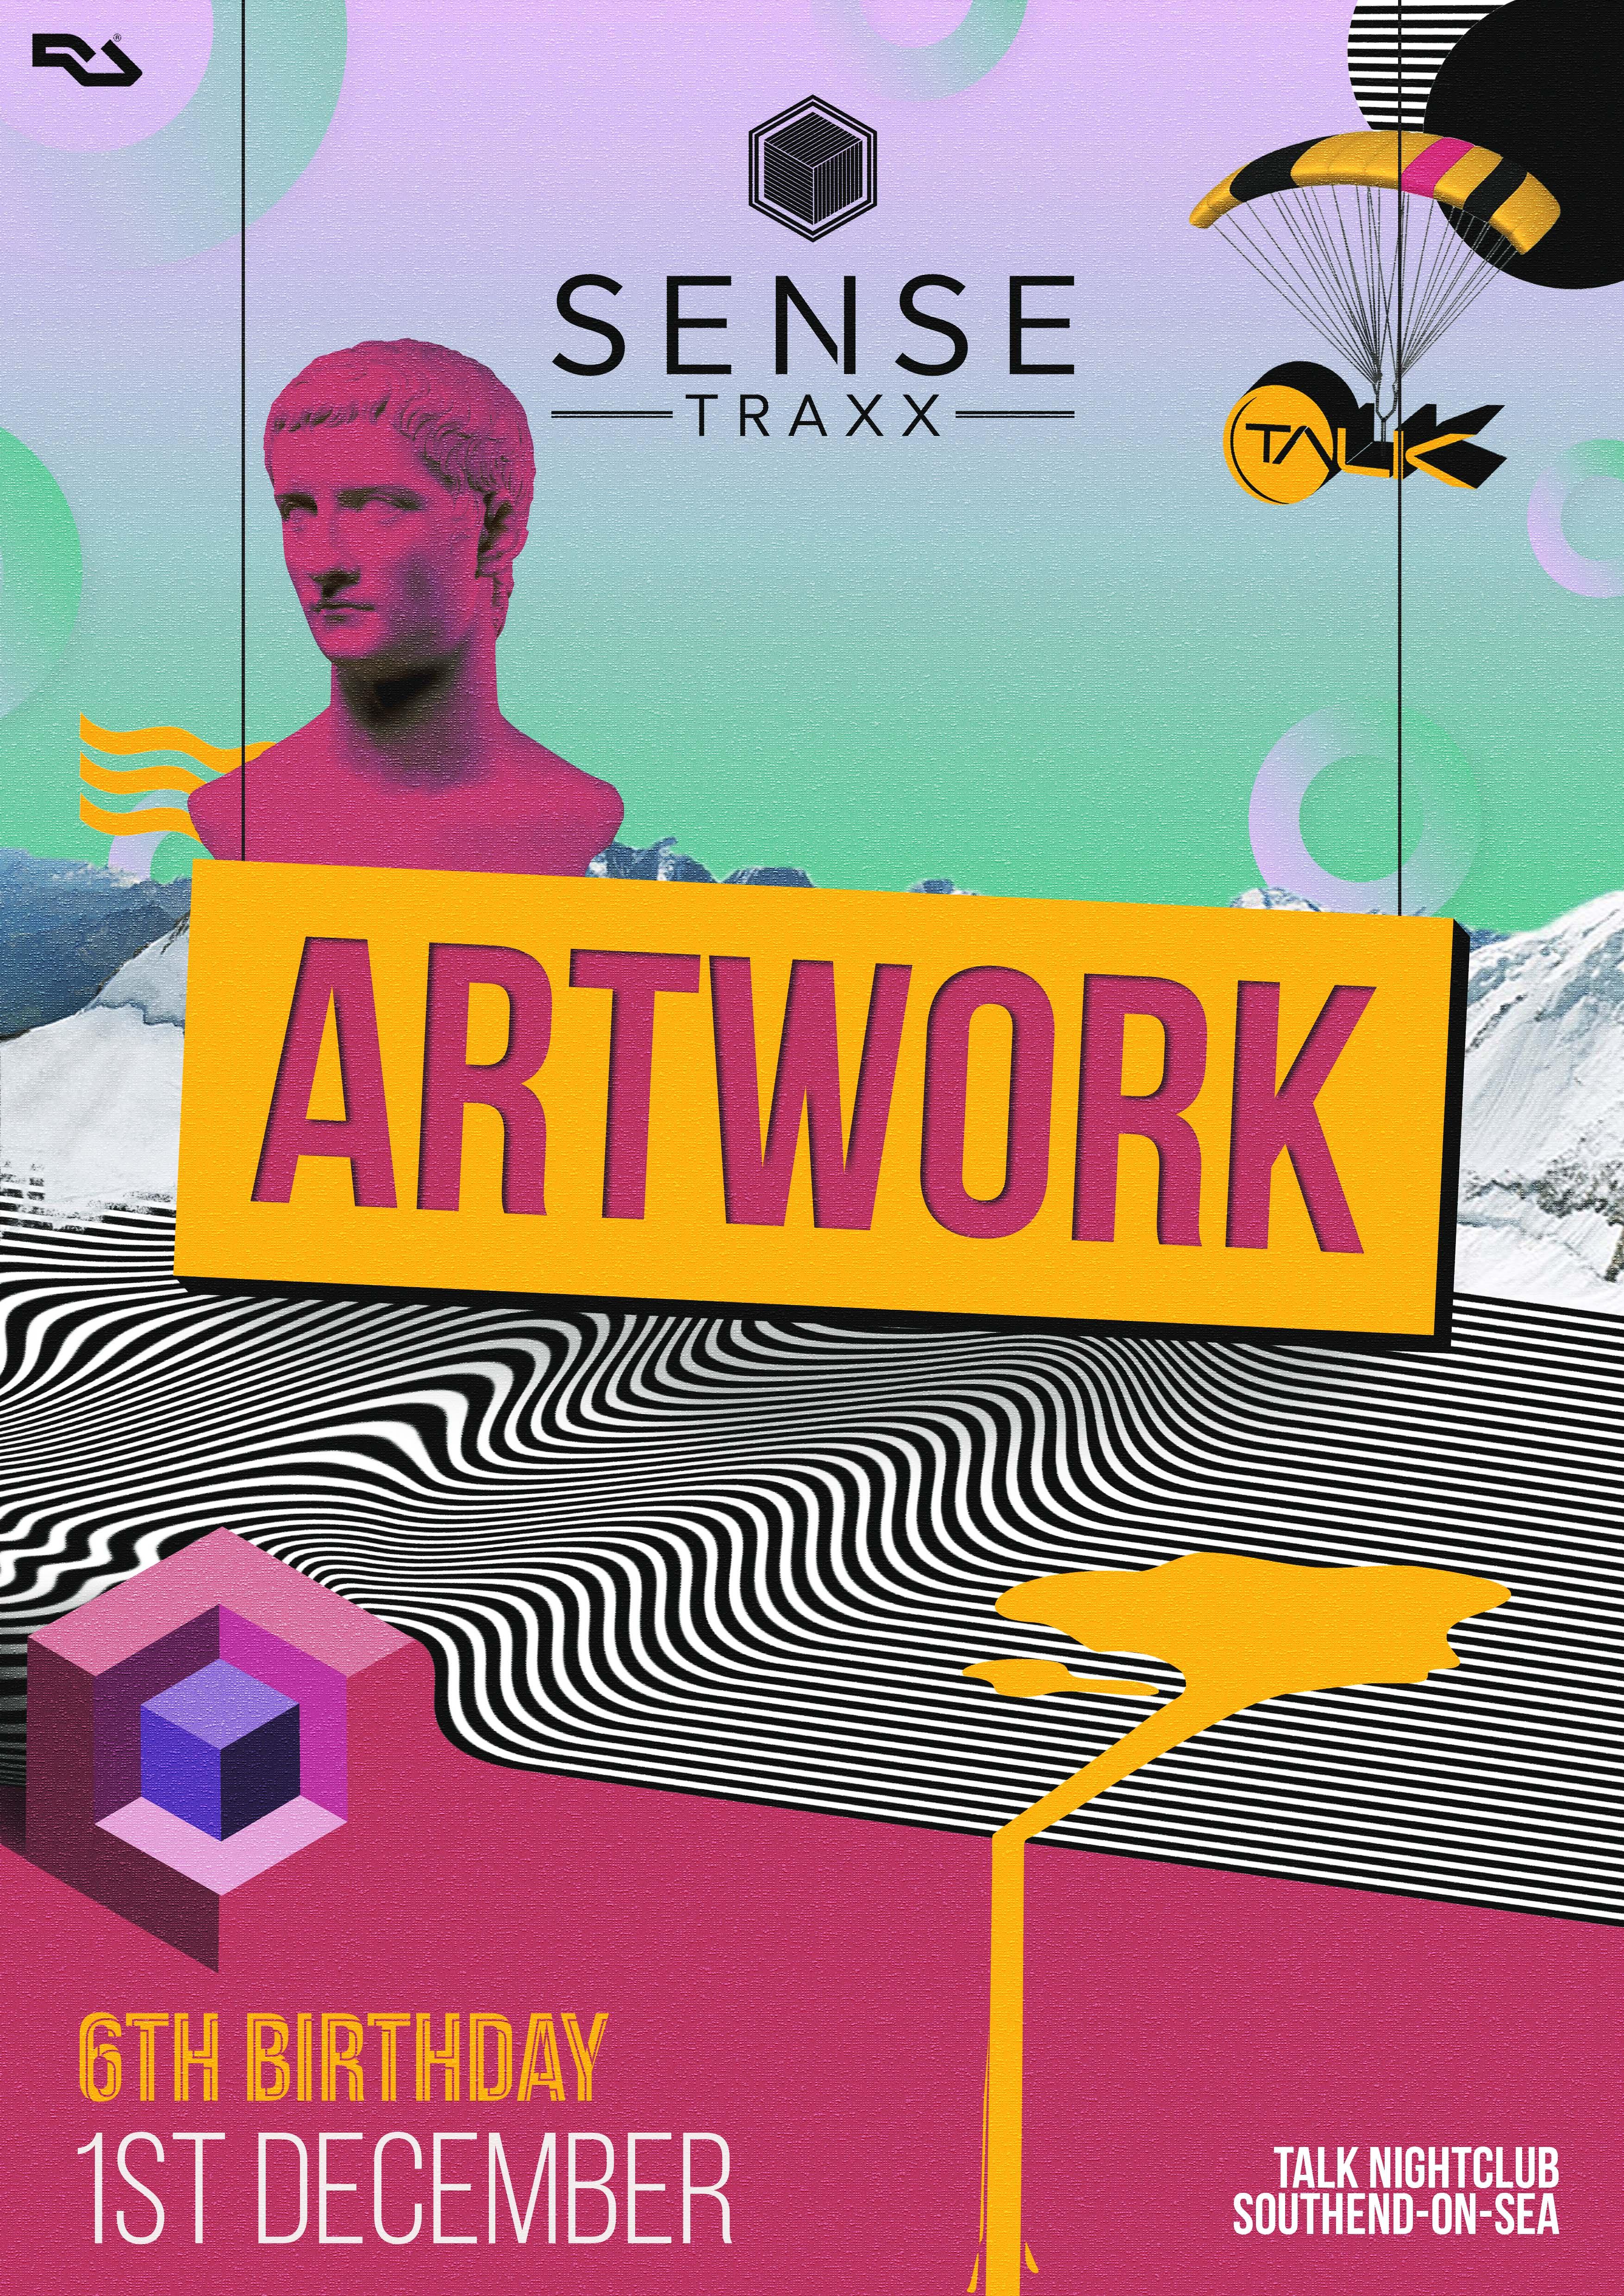 sense_traxx_-_6th_birthday_-_artwork.jpg